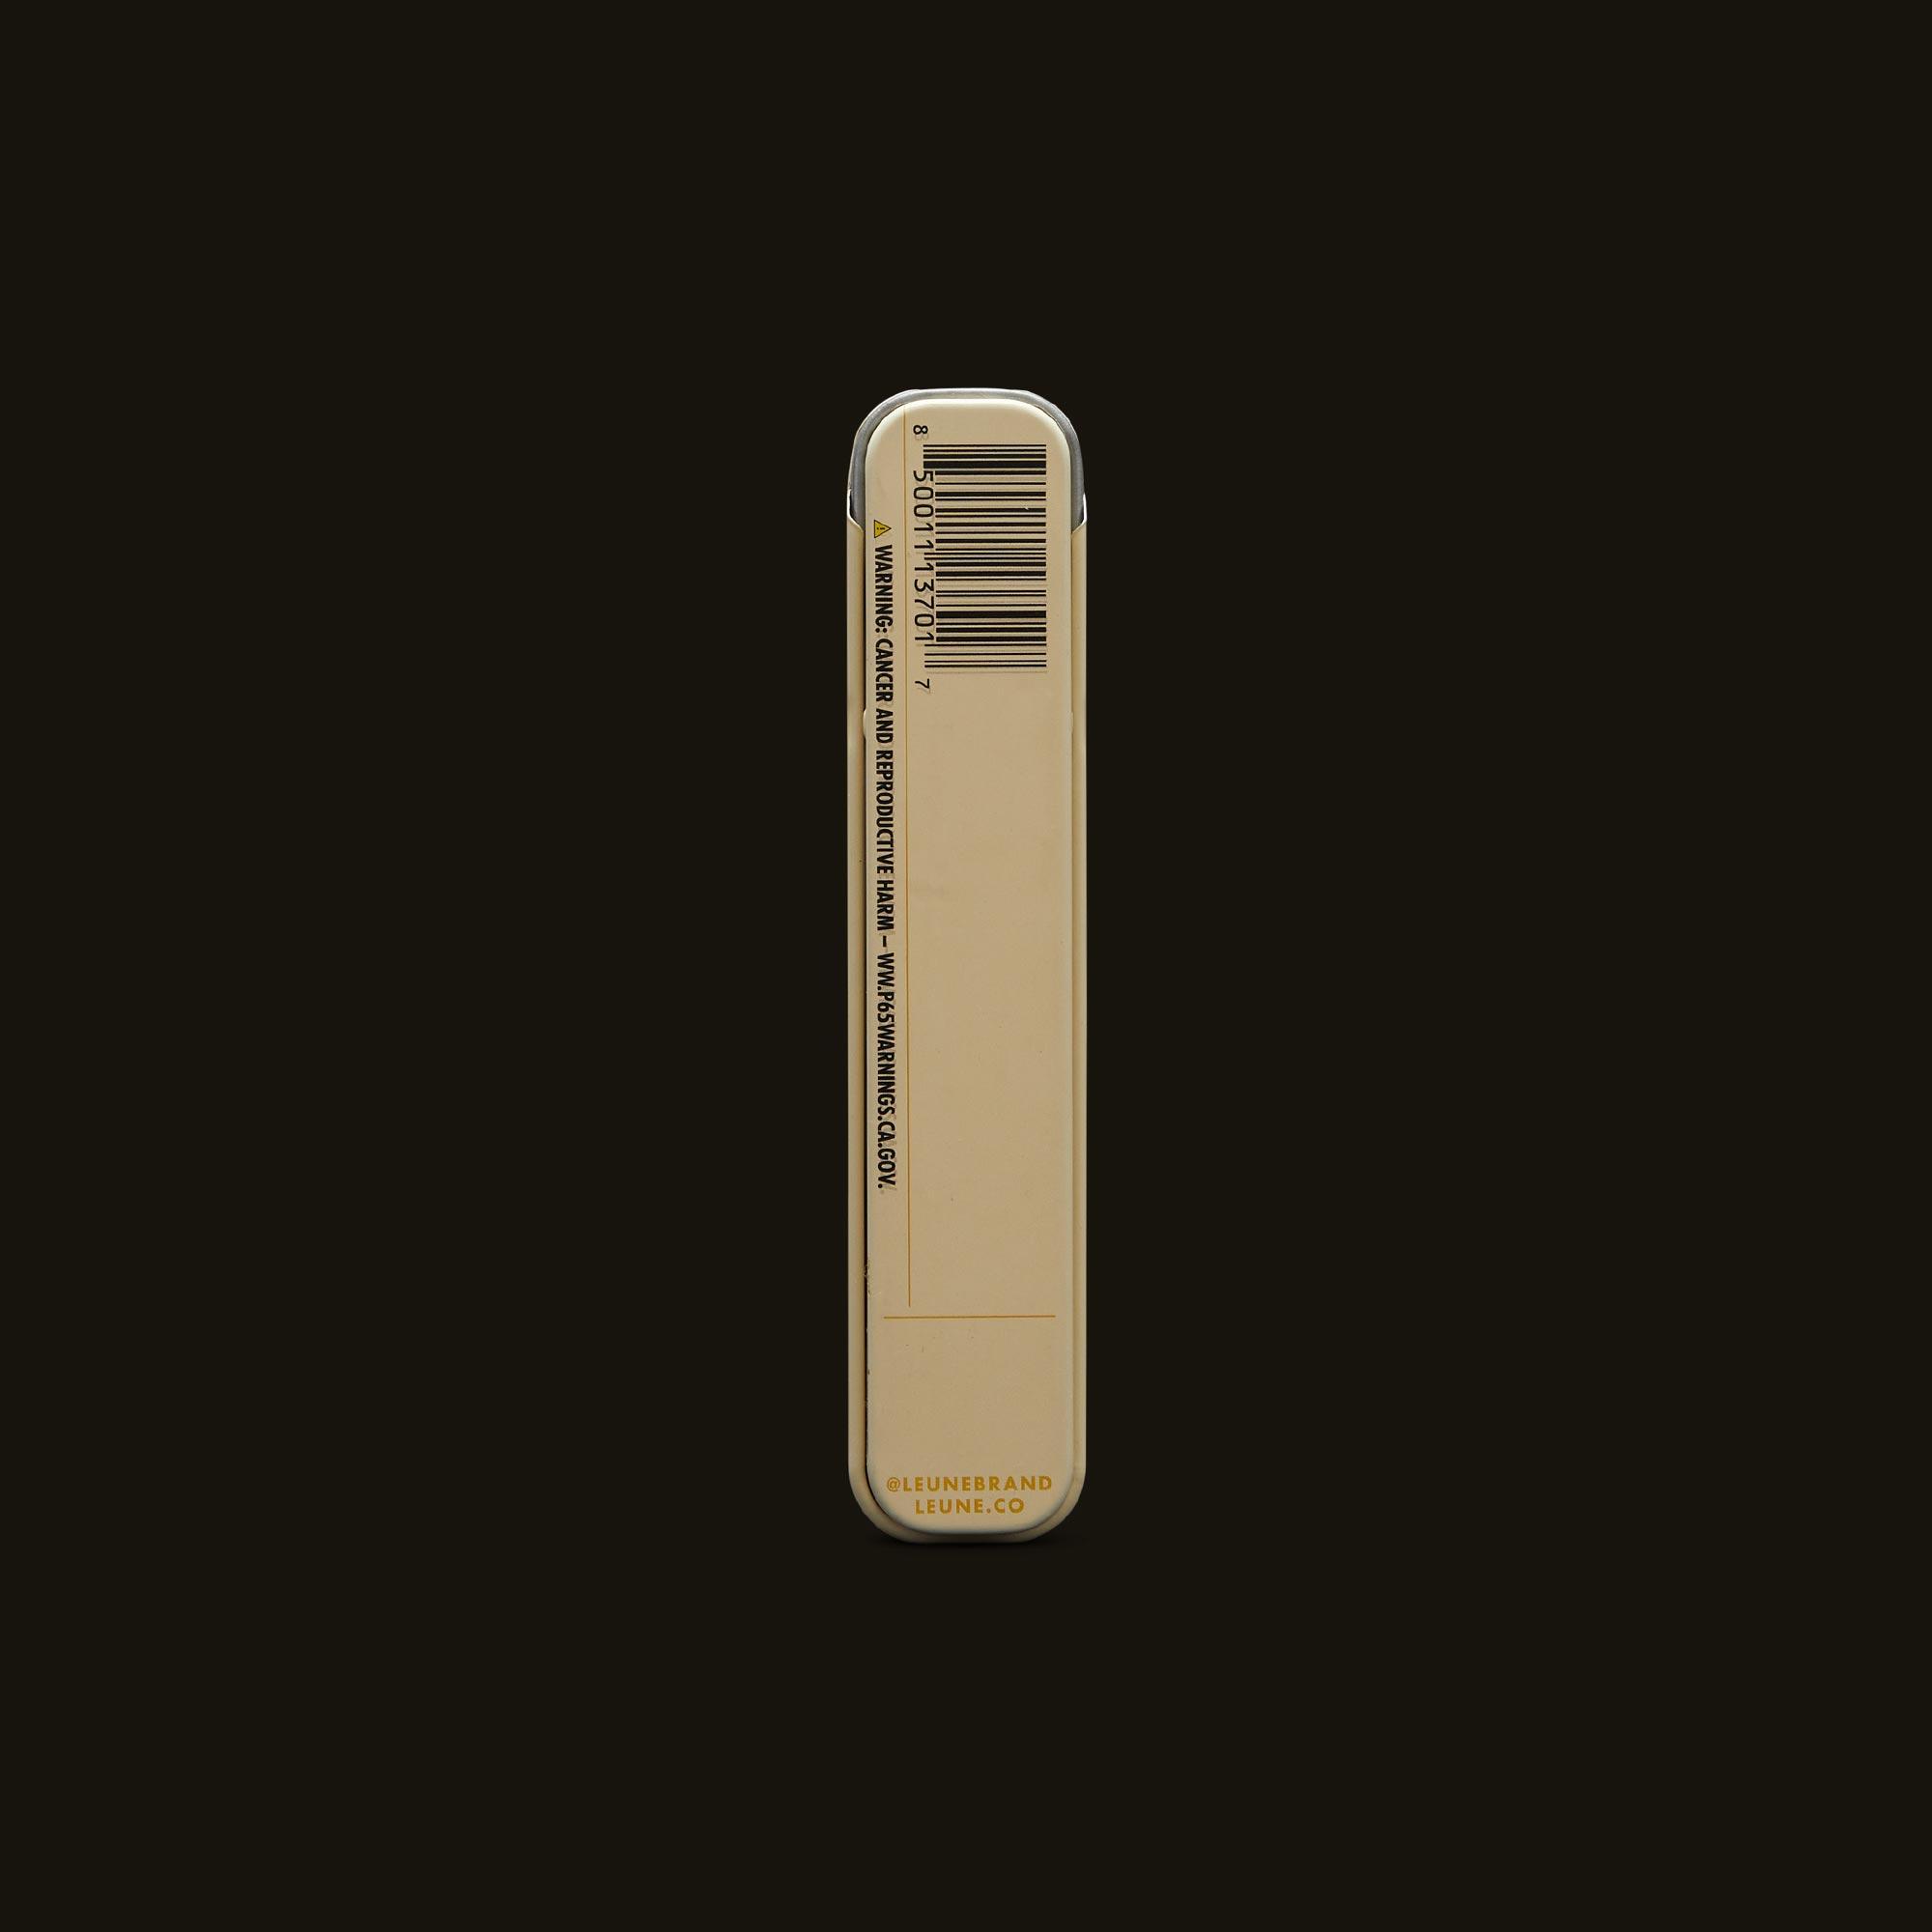 LEUNE Vape Pen - Desert Gold Disposable